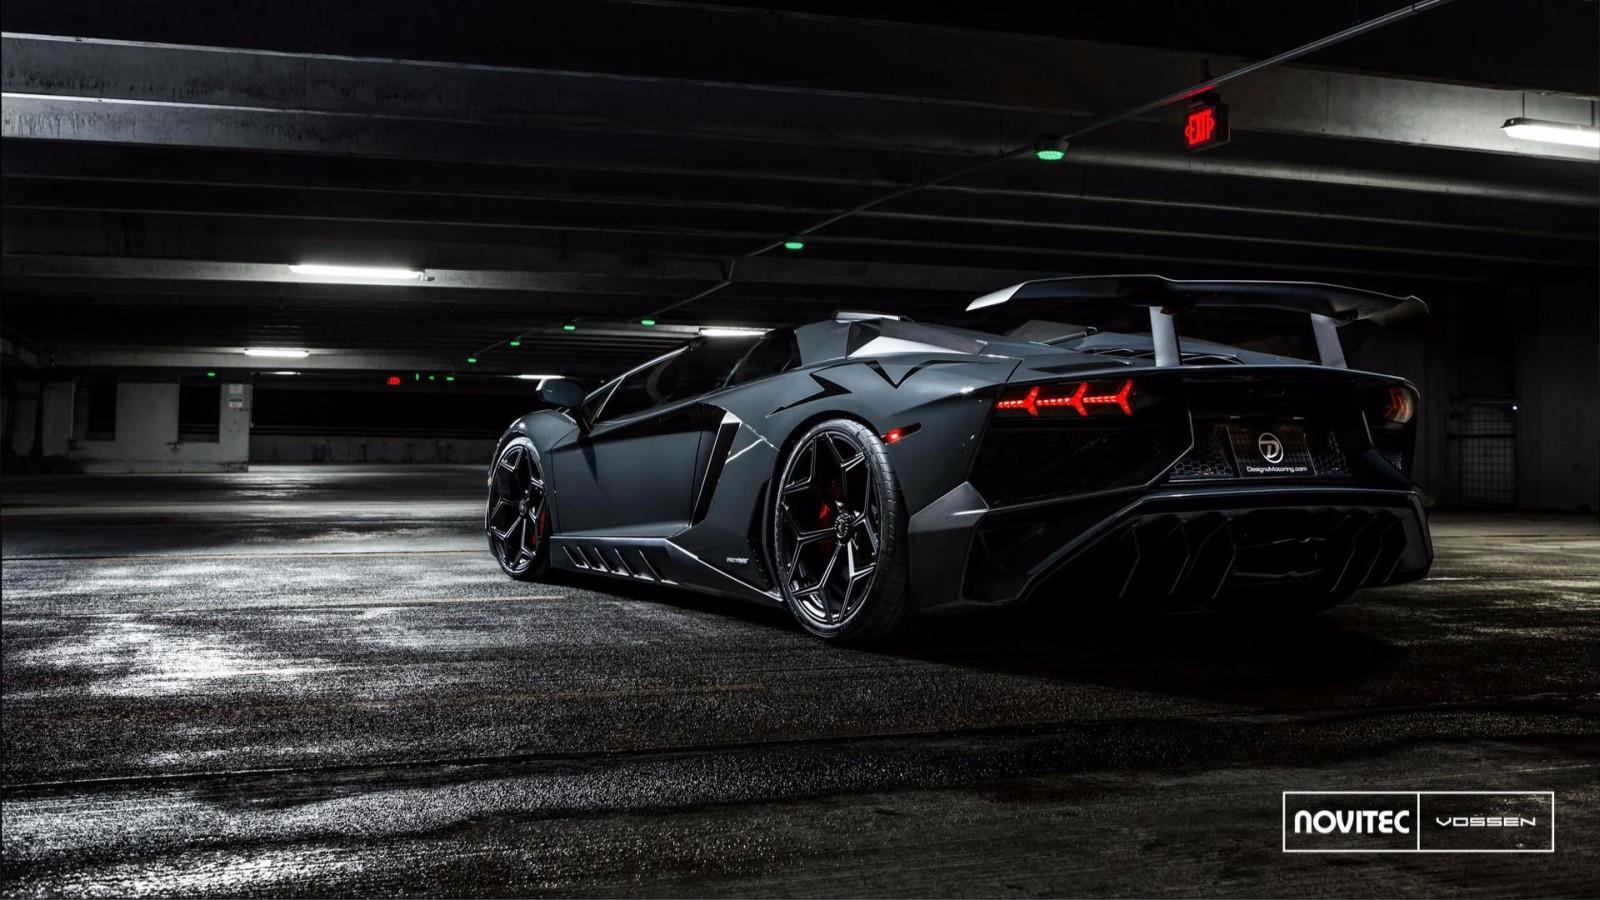 Novitec Torado Lamborghini Aventador Sv Roadster Looks Absolutely Heavenly Motoroids